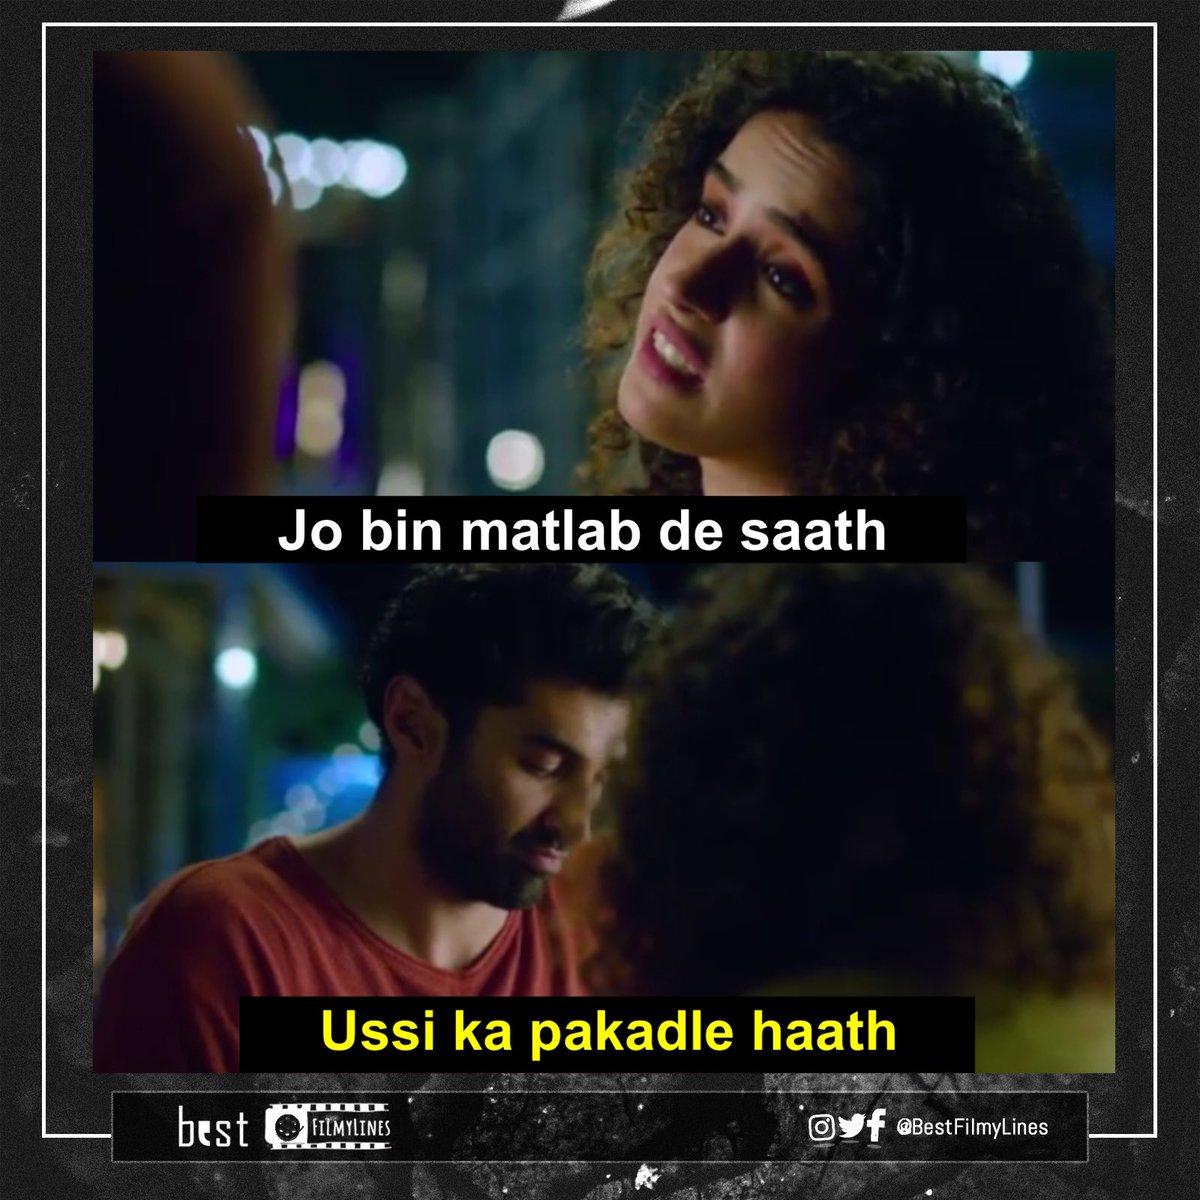 -Ludo (2020), dir. Anurag Basu . . #Ludo #LudoMovie #adityaroykapur #sanyamalhotra #anuragbasu #bollywood #bollywoodmovie #bollywoodmovies #bollywooddialogue #indiancinema #hindi #hindimovie #dialogue #dialogues #quote #quotes #bestfilmylines